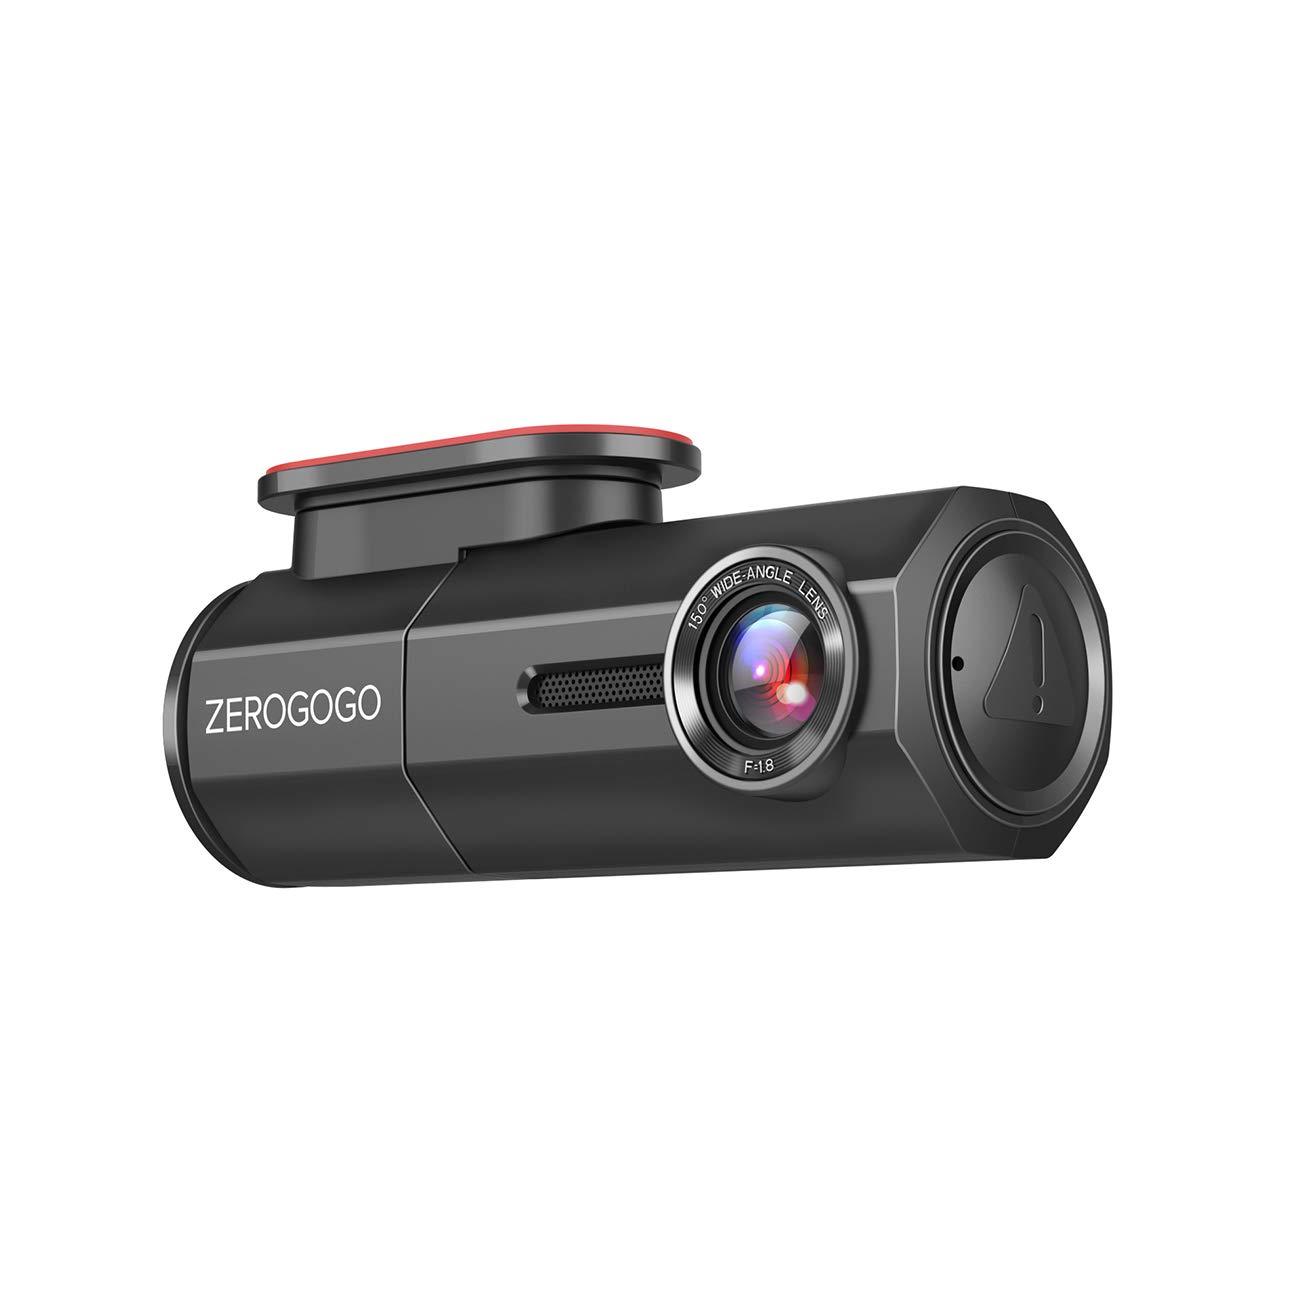 Zerogogo RW100 WiFi Dash Cam Full HD 1080P Car Camera w/Sony Sensor, Magnetic Bracket, Night Vision, Super Capacitor, G-Sensor, 360 Degree Rotatable Lens